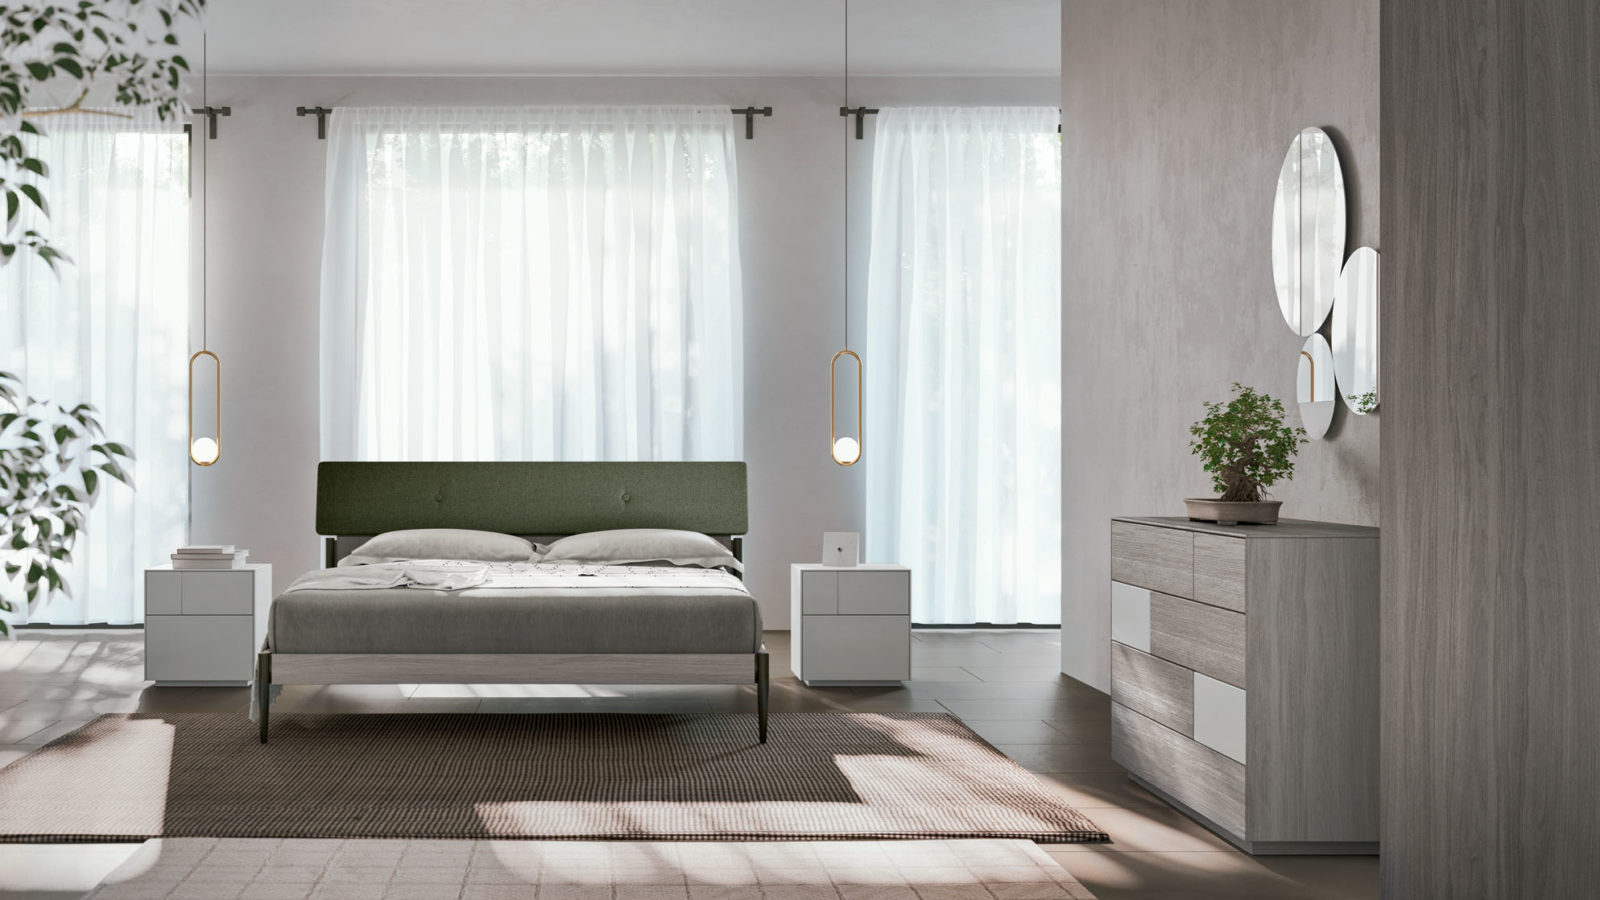 letto-adele-6-orme-1600x900-1